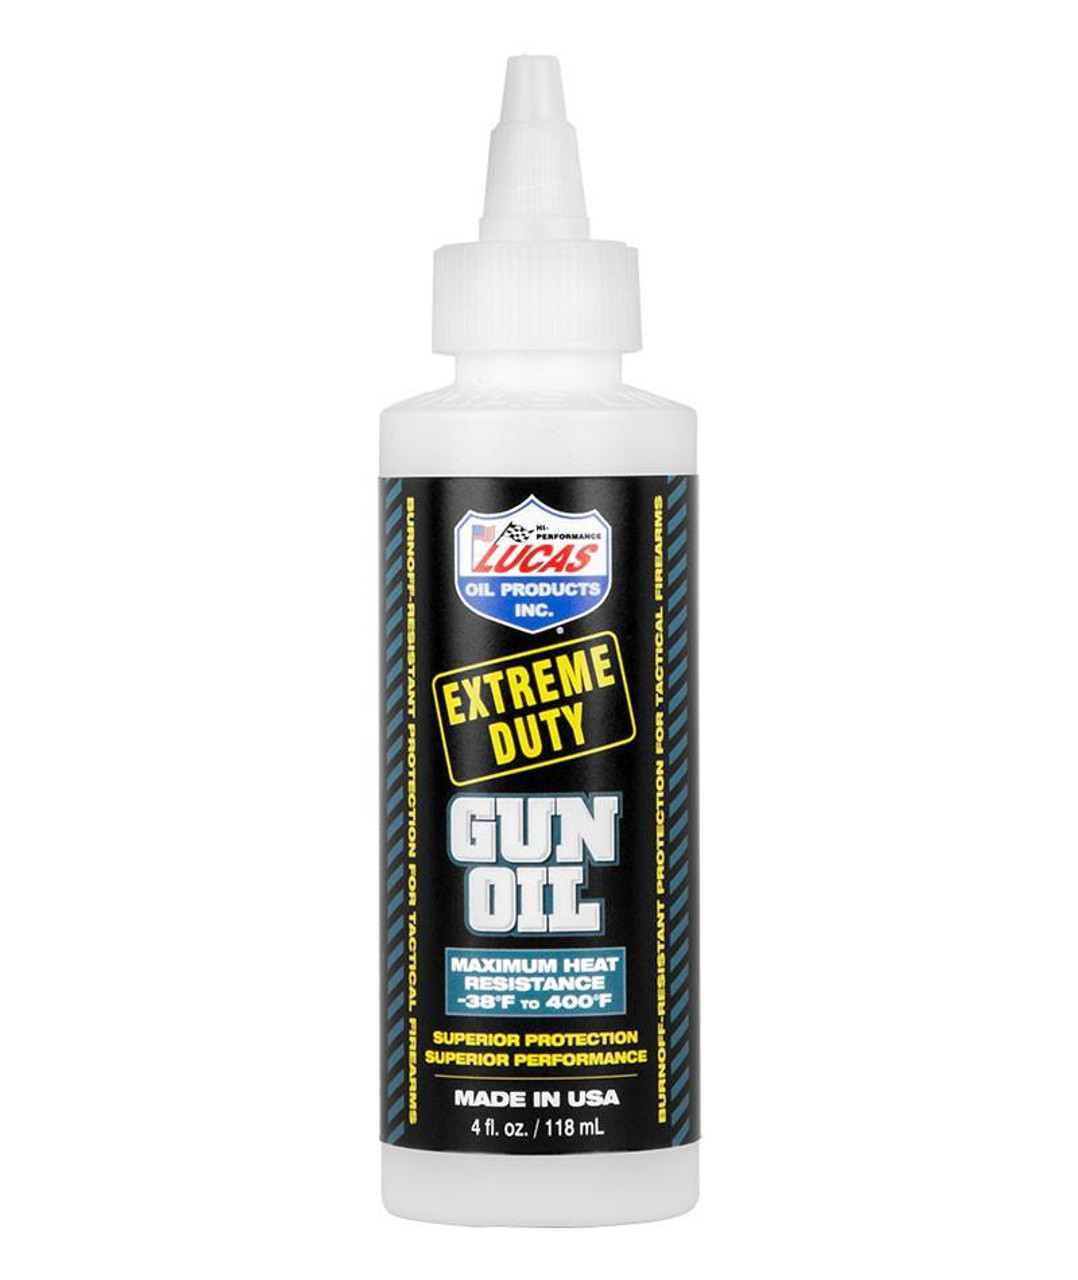 Lucas Extreme Duty Gun Oil